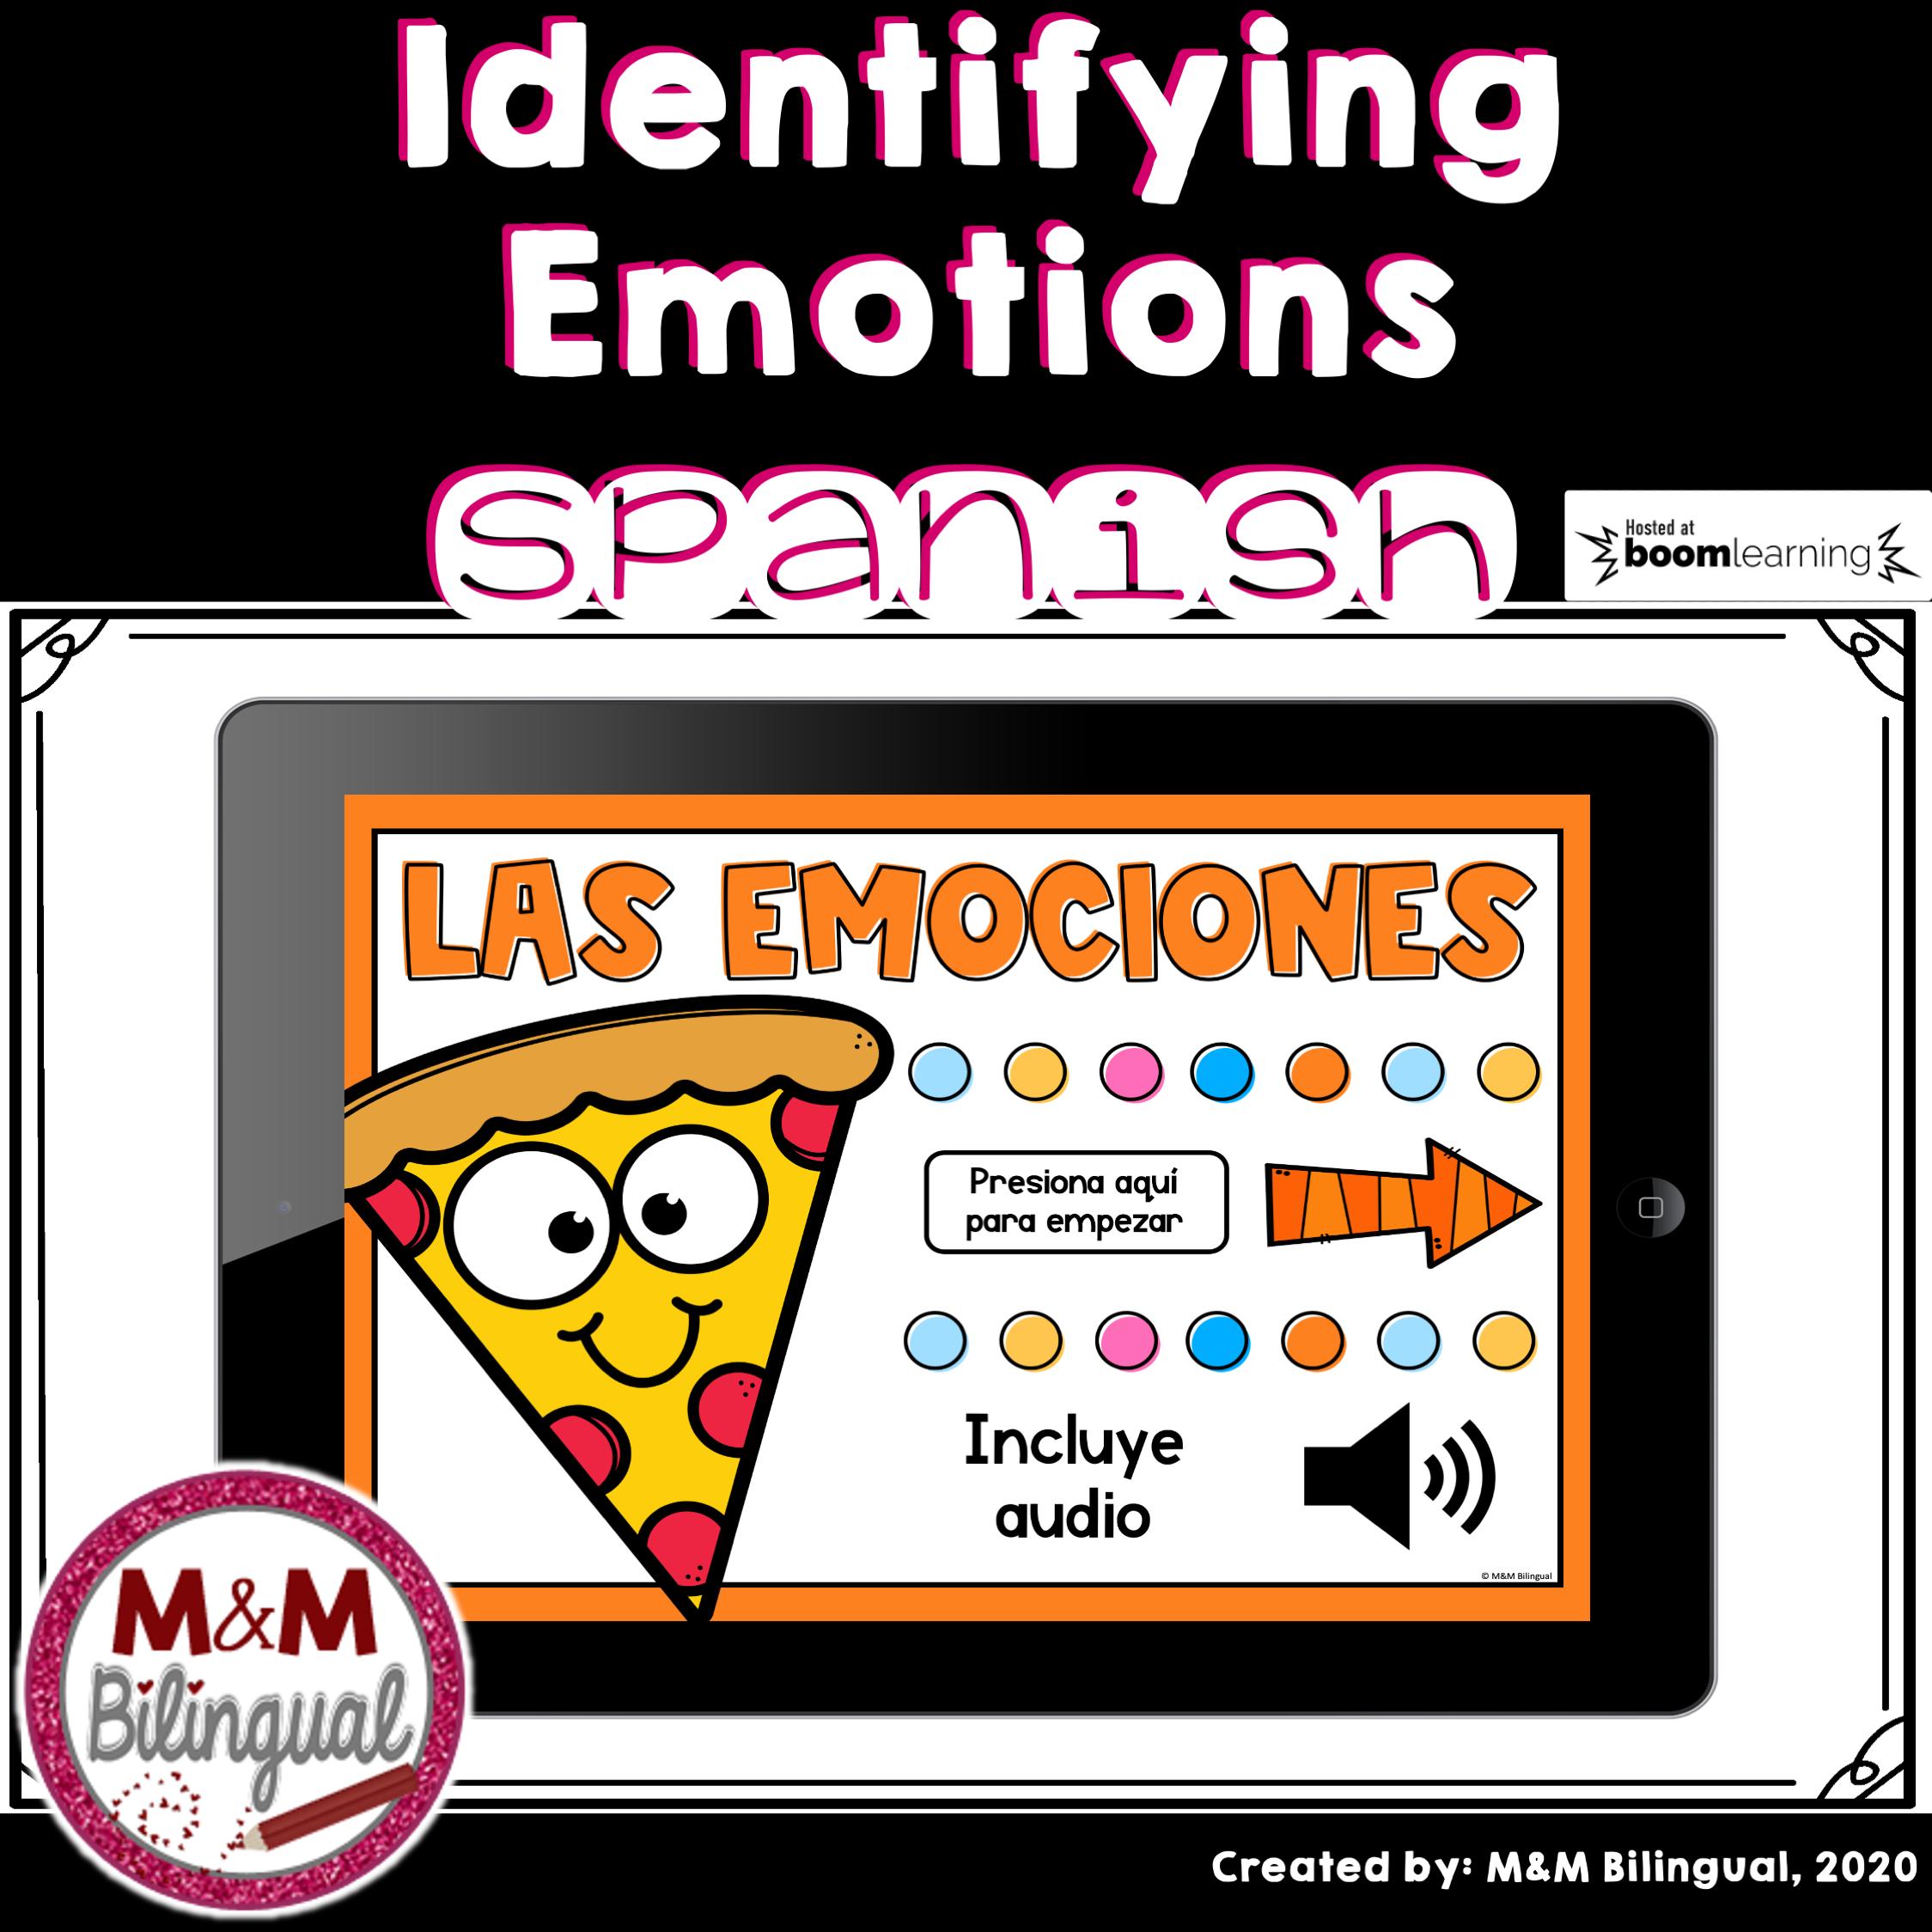 Identifying Emotions In Spanish In